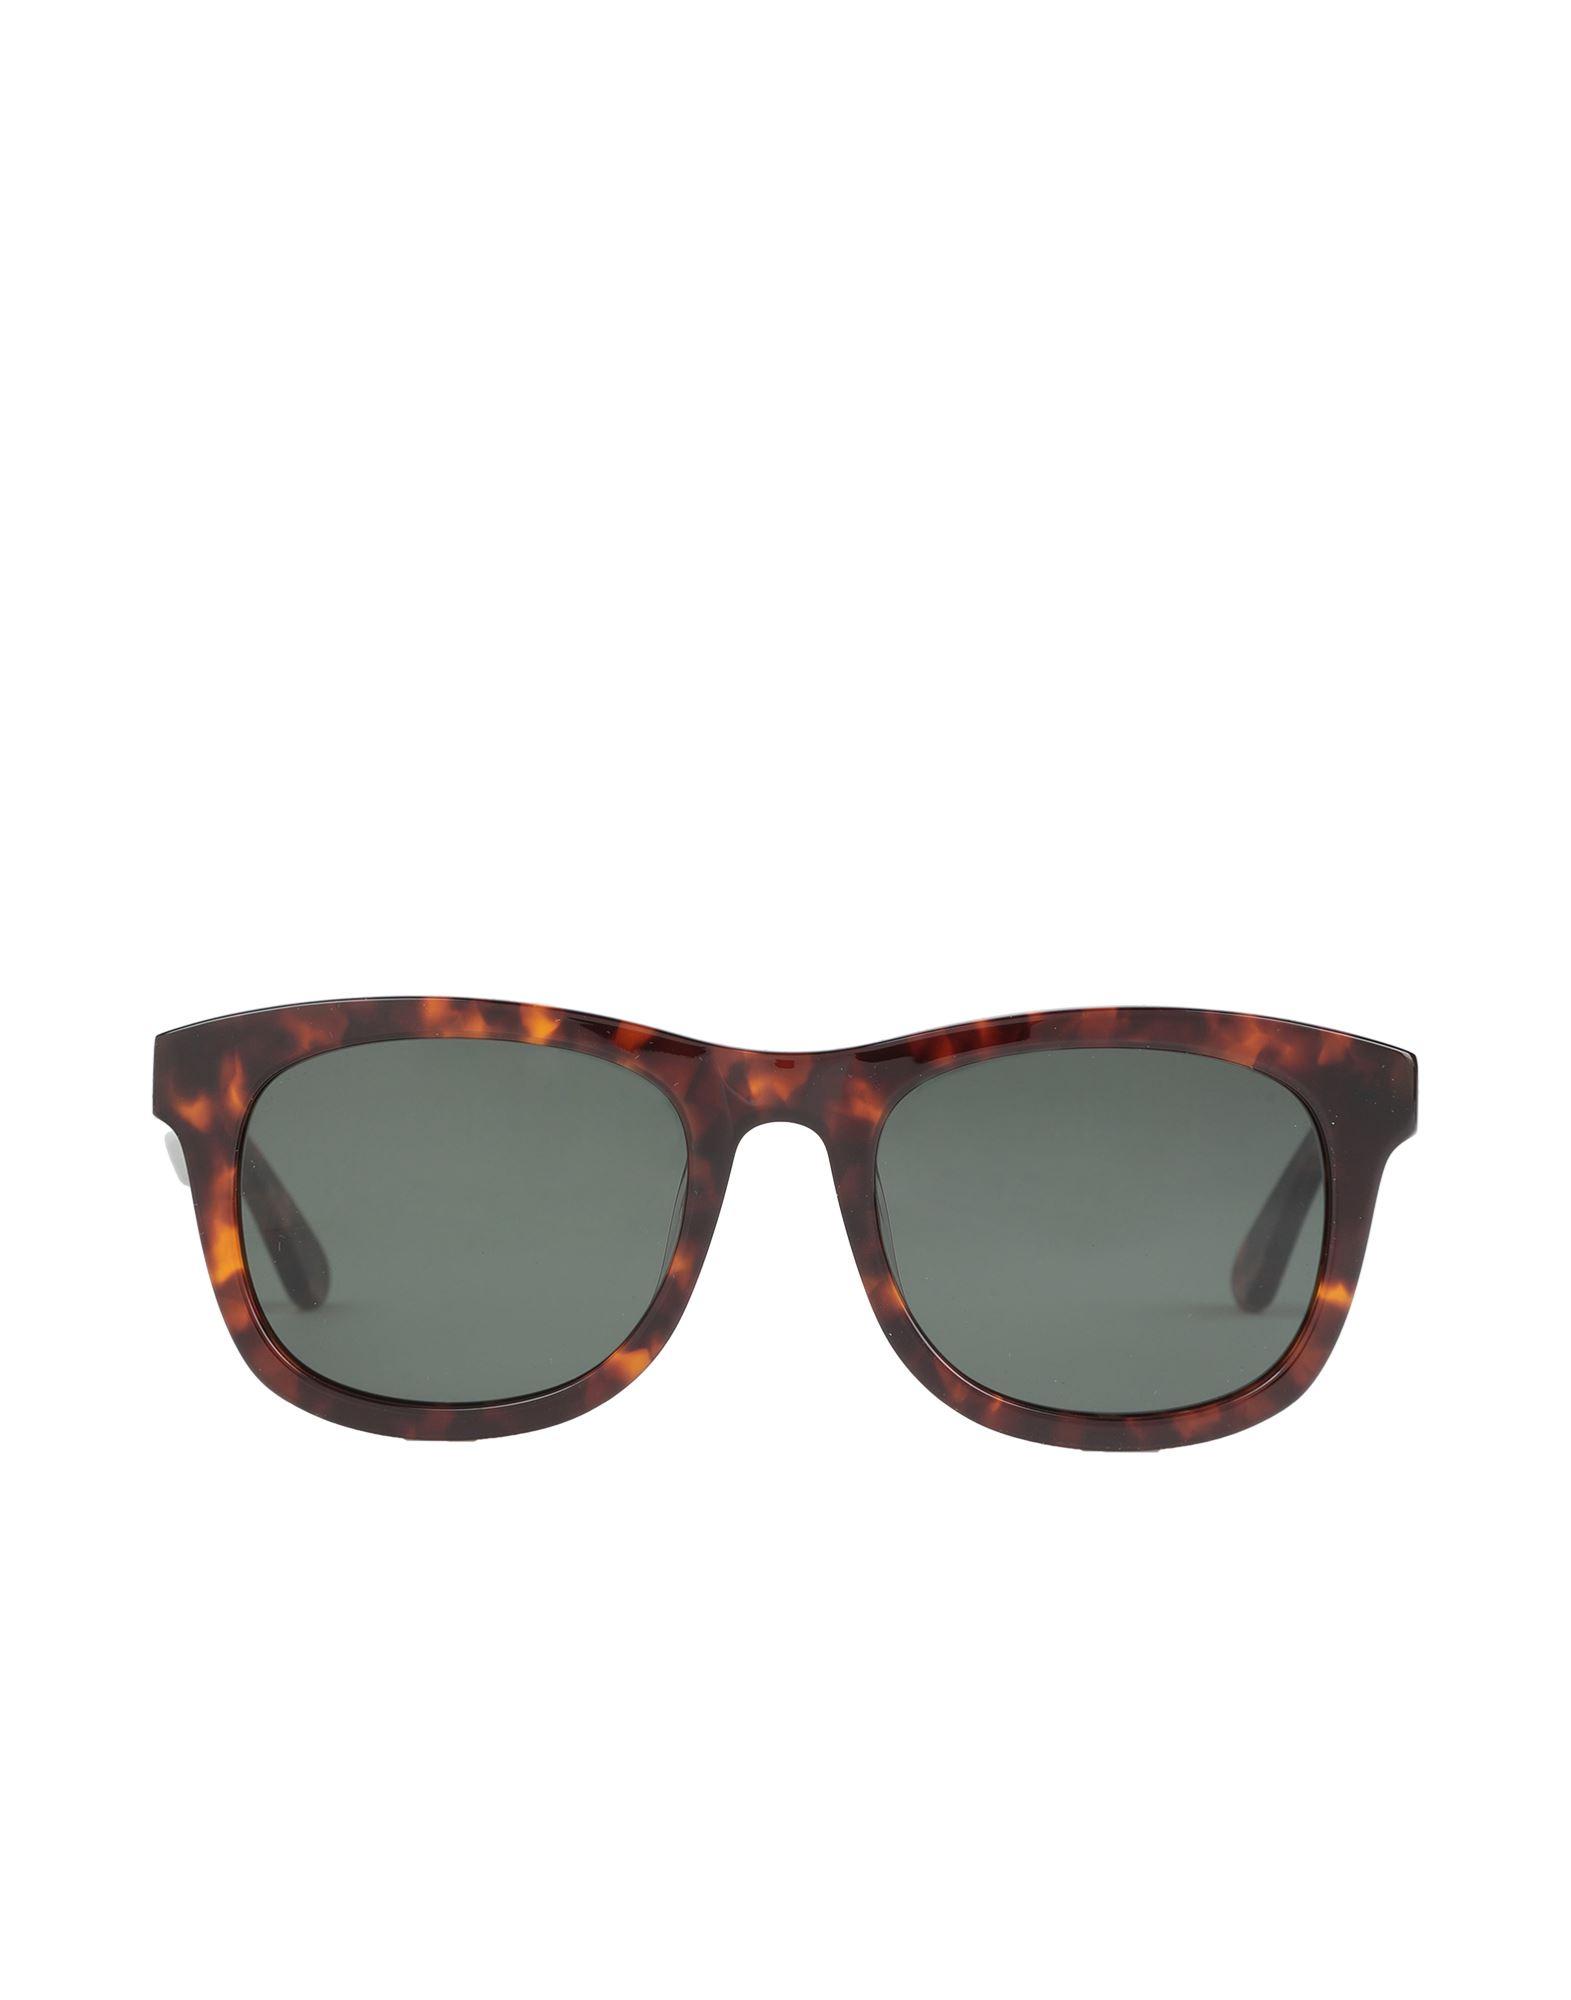 HAN KJØBENHAVN Sunglasses - Item 46737540